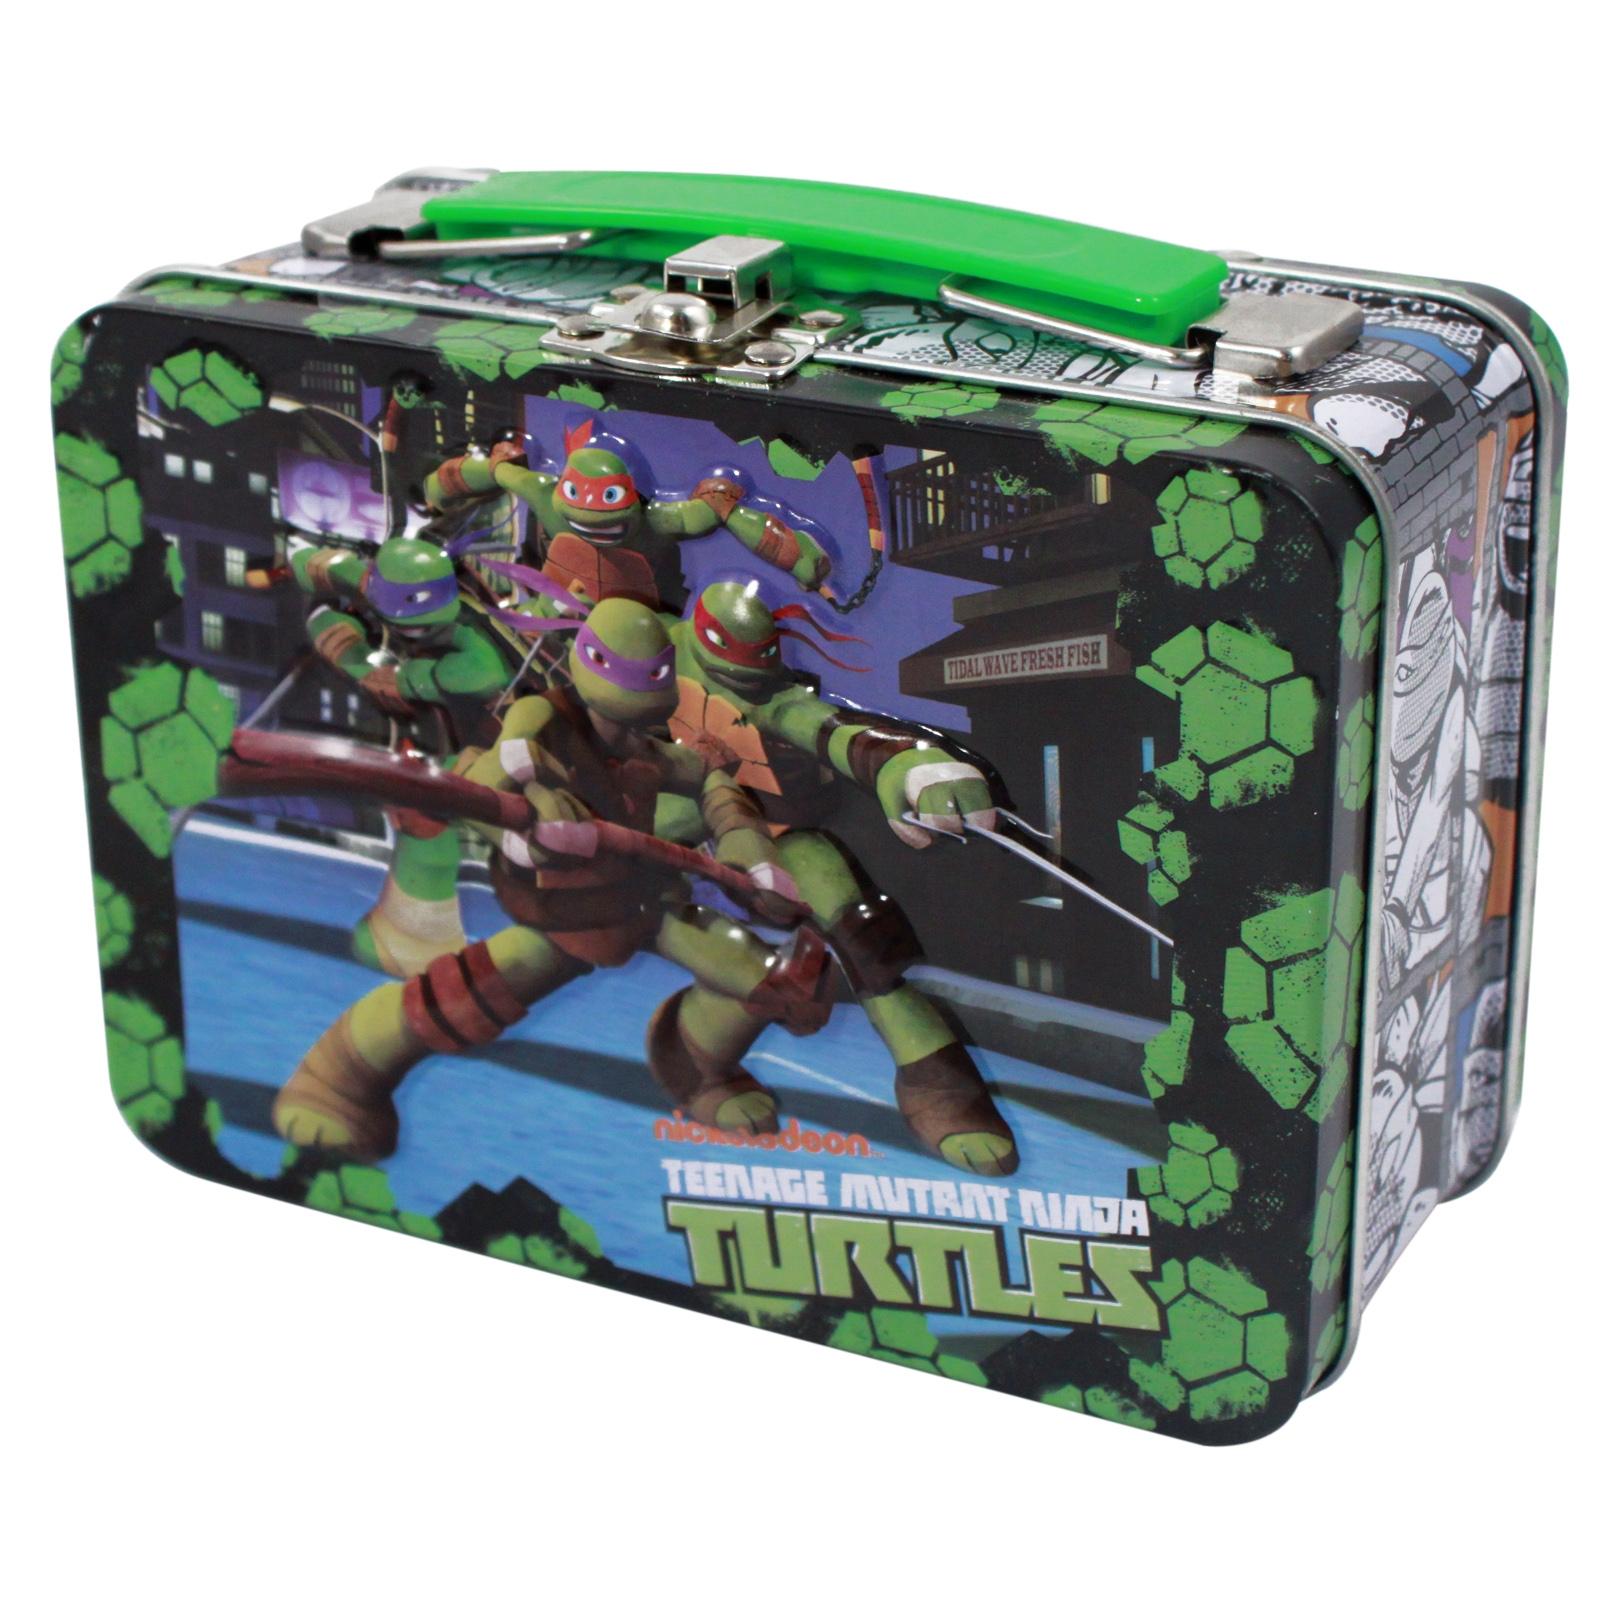 Teenage Mutant Ninja Turtles 48 piece Puzzle with Tin Lunch Box leonardo michelangelo raphael donatello